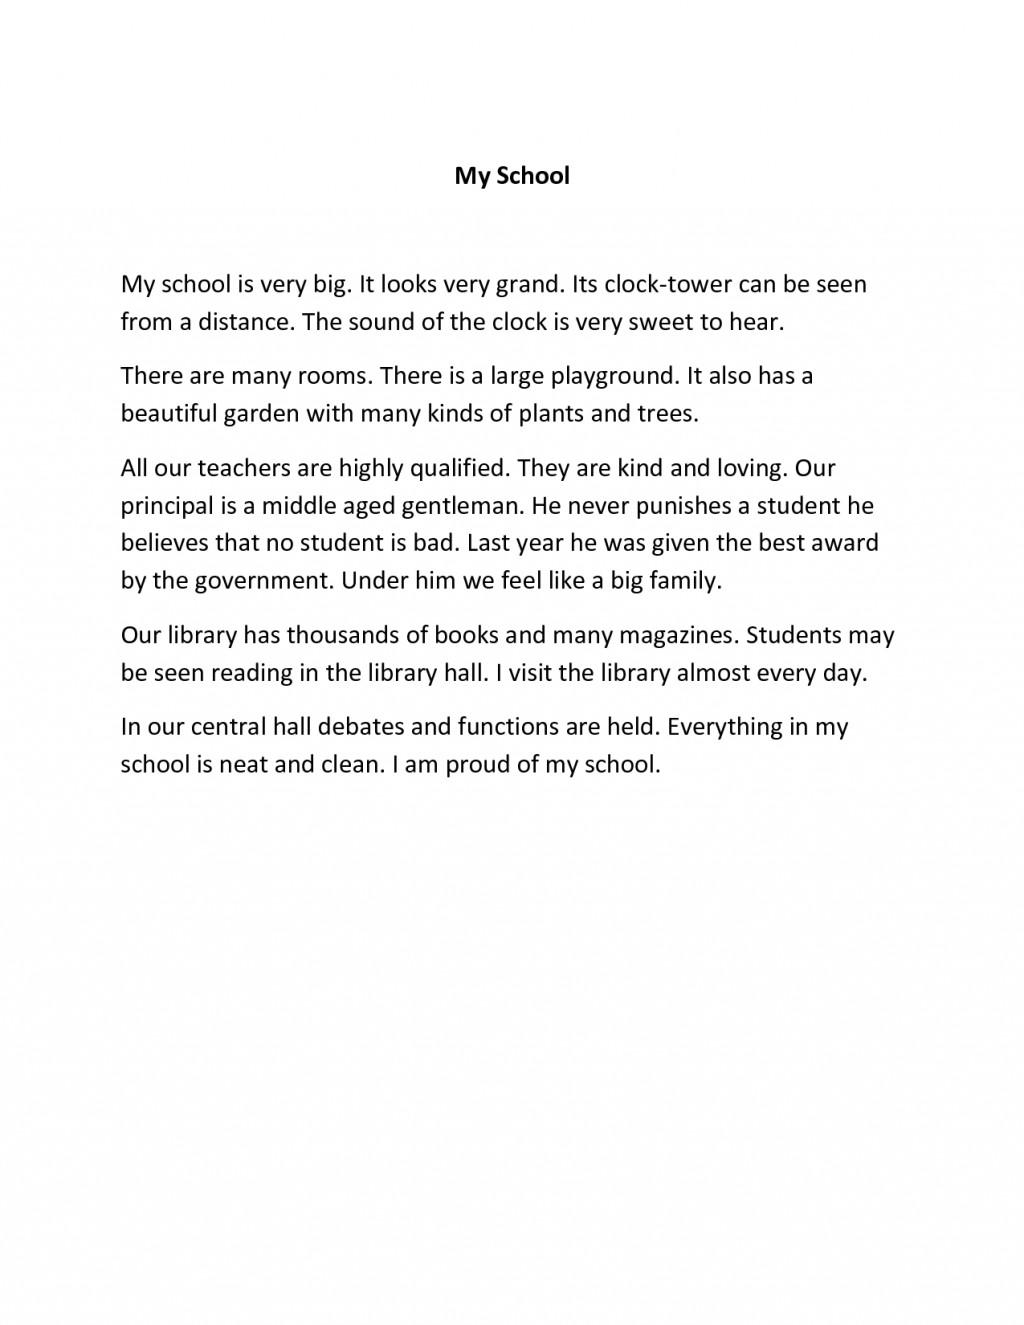 002 Essay Example My School Amazing Dream For Class 10 In Urdu 1 3 Marathi Large